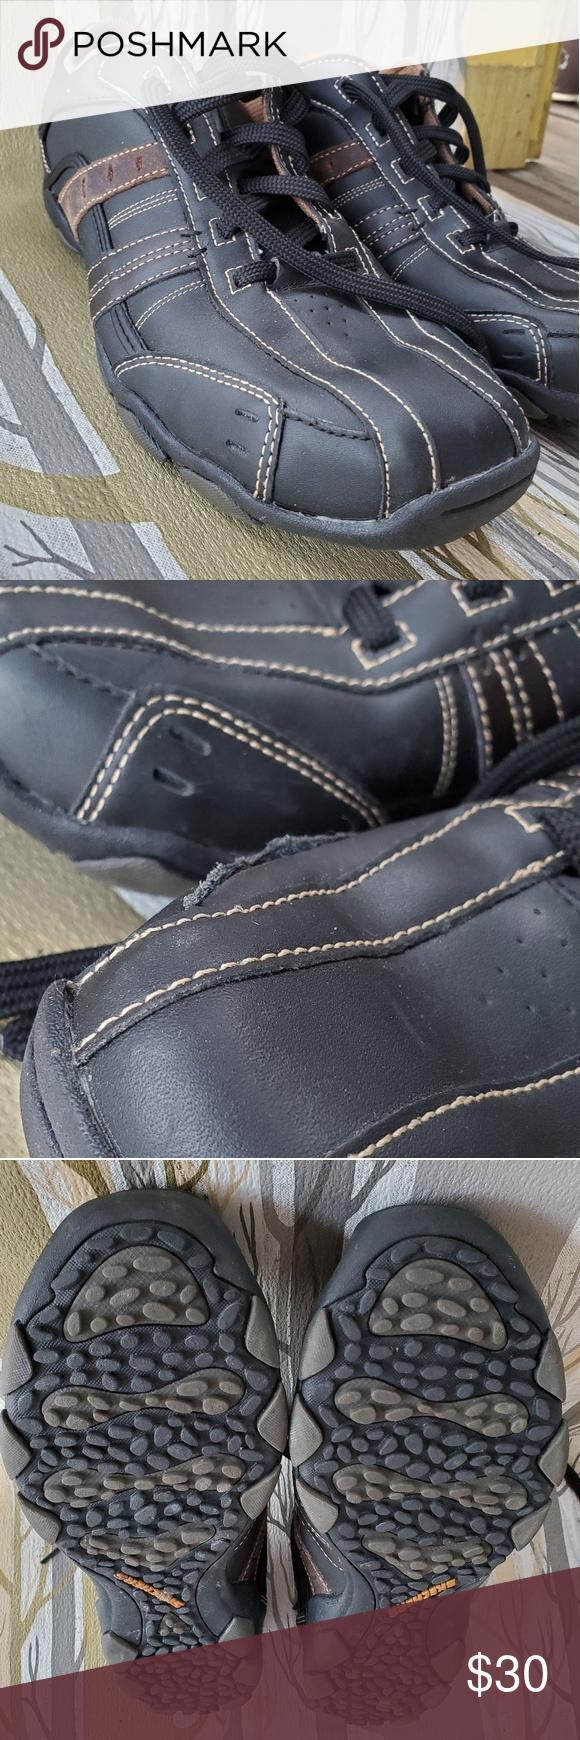 Mens sketchers leather tennis shoes